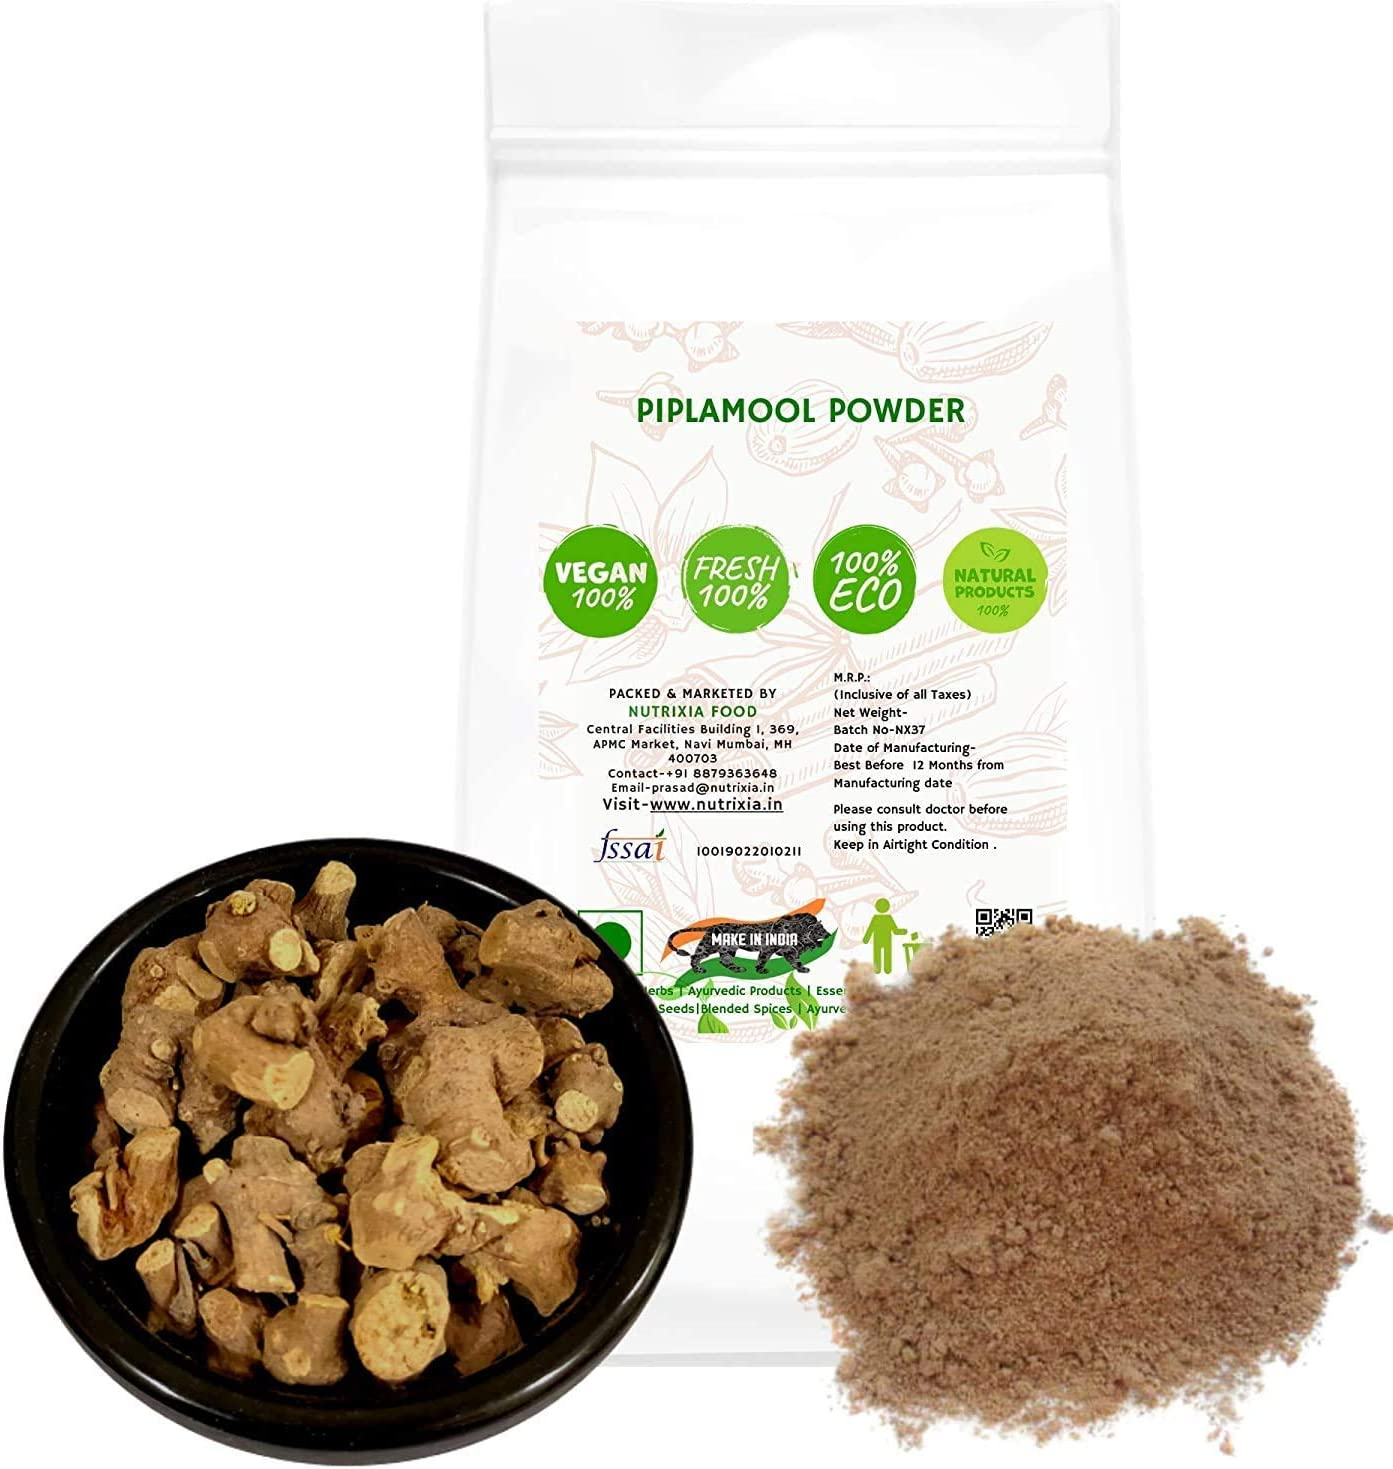 Marbella Piplamool Powder Sales results No. 1 Max 75% OFF Ganthoda Pipla MUL Pipal